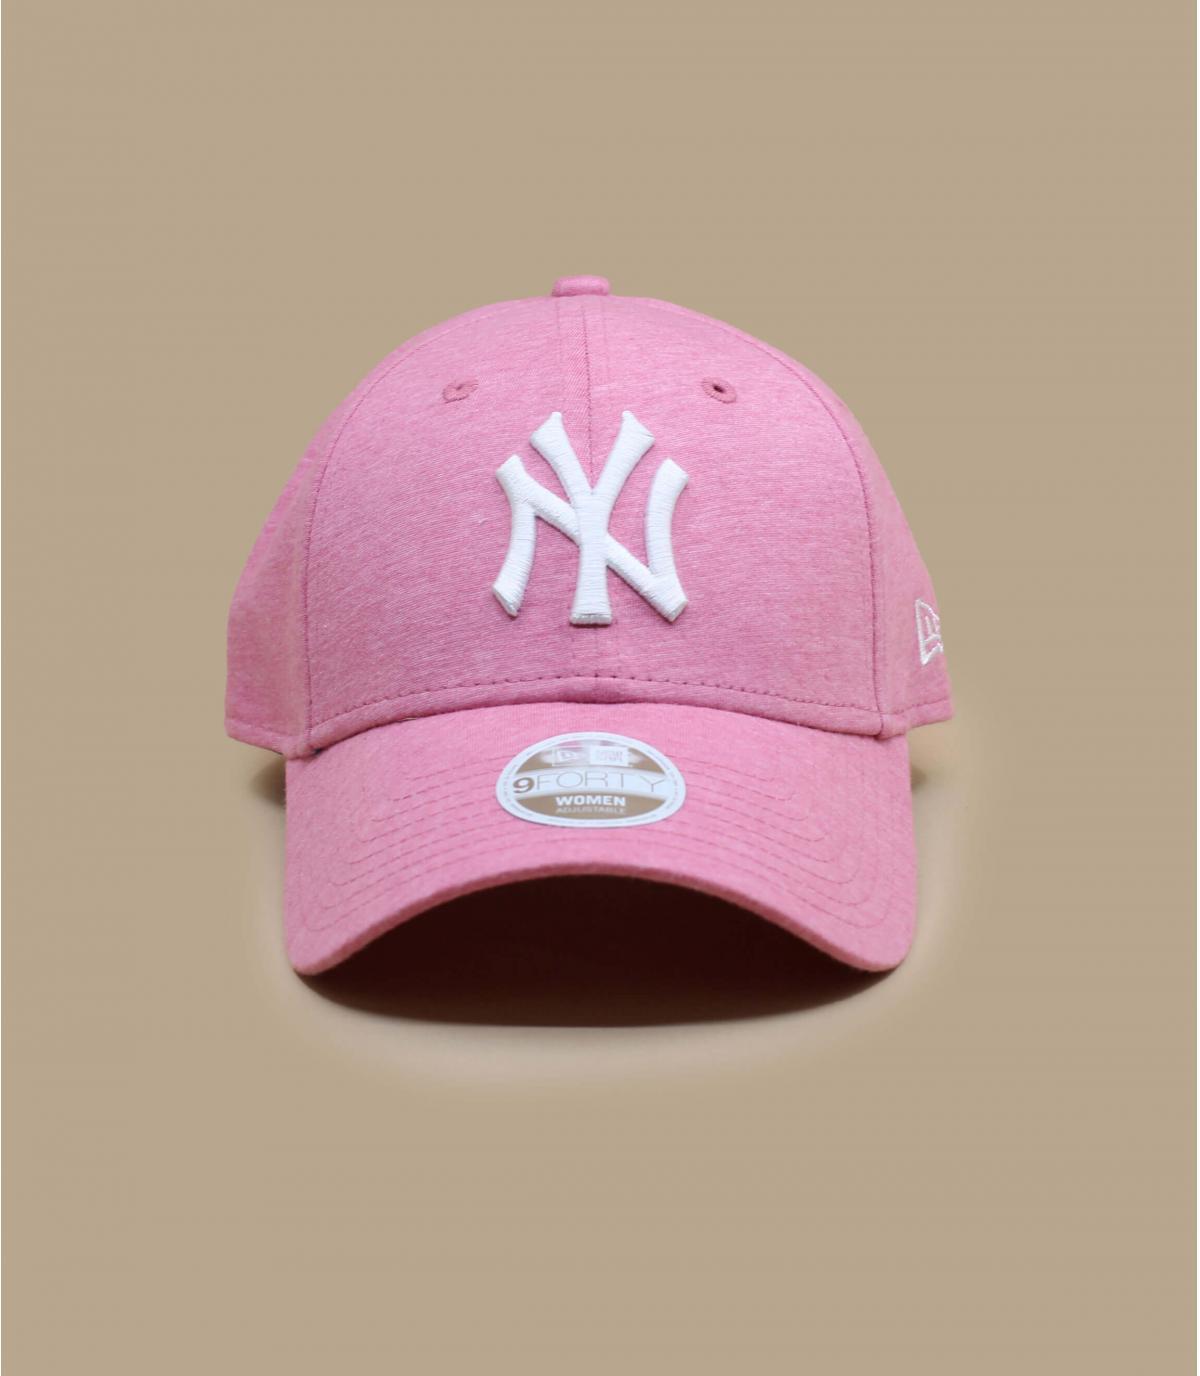 Details Wmn Jersey Ess 940 NY pink - afbeeling 2